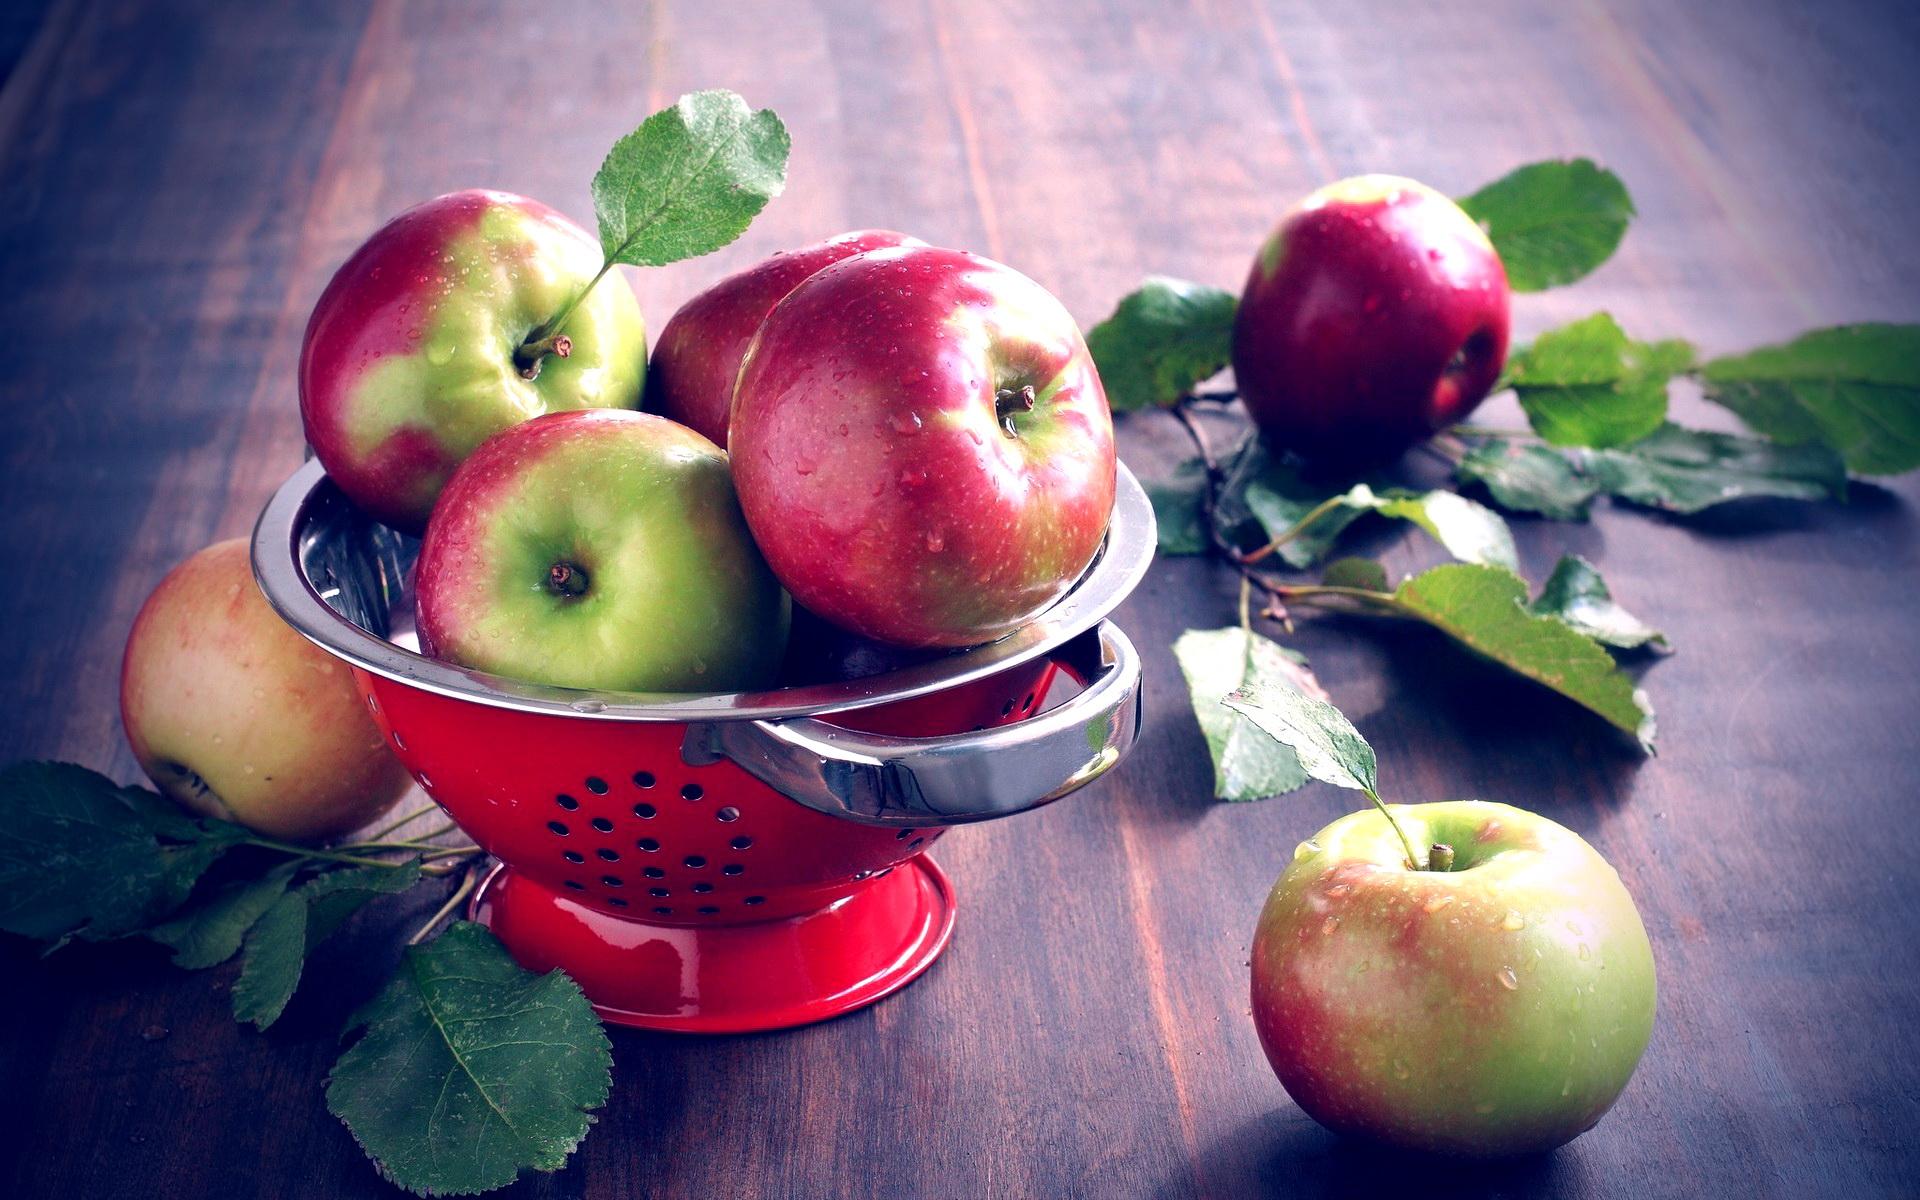 картинки яблоки на столе садового посадка